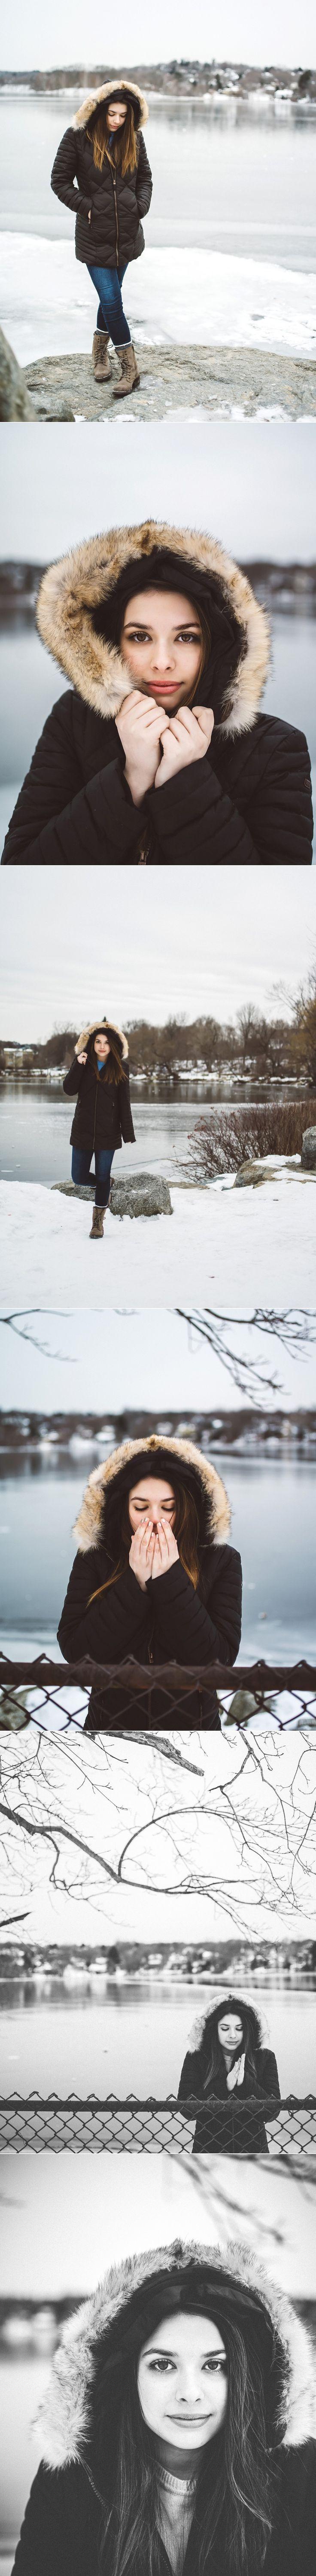 Snowy High School Senior Portraits | Posing and Styles in Fur Winter Coat | Elizabeth Clark Photography, Boston MA